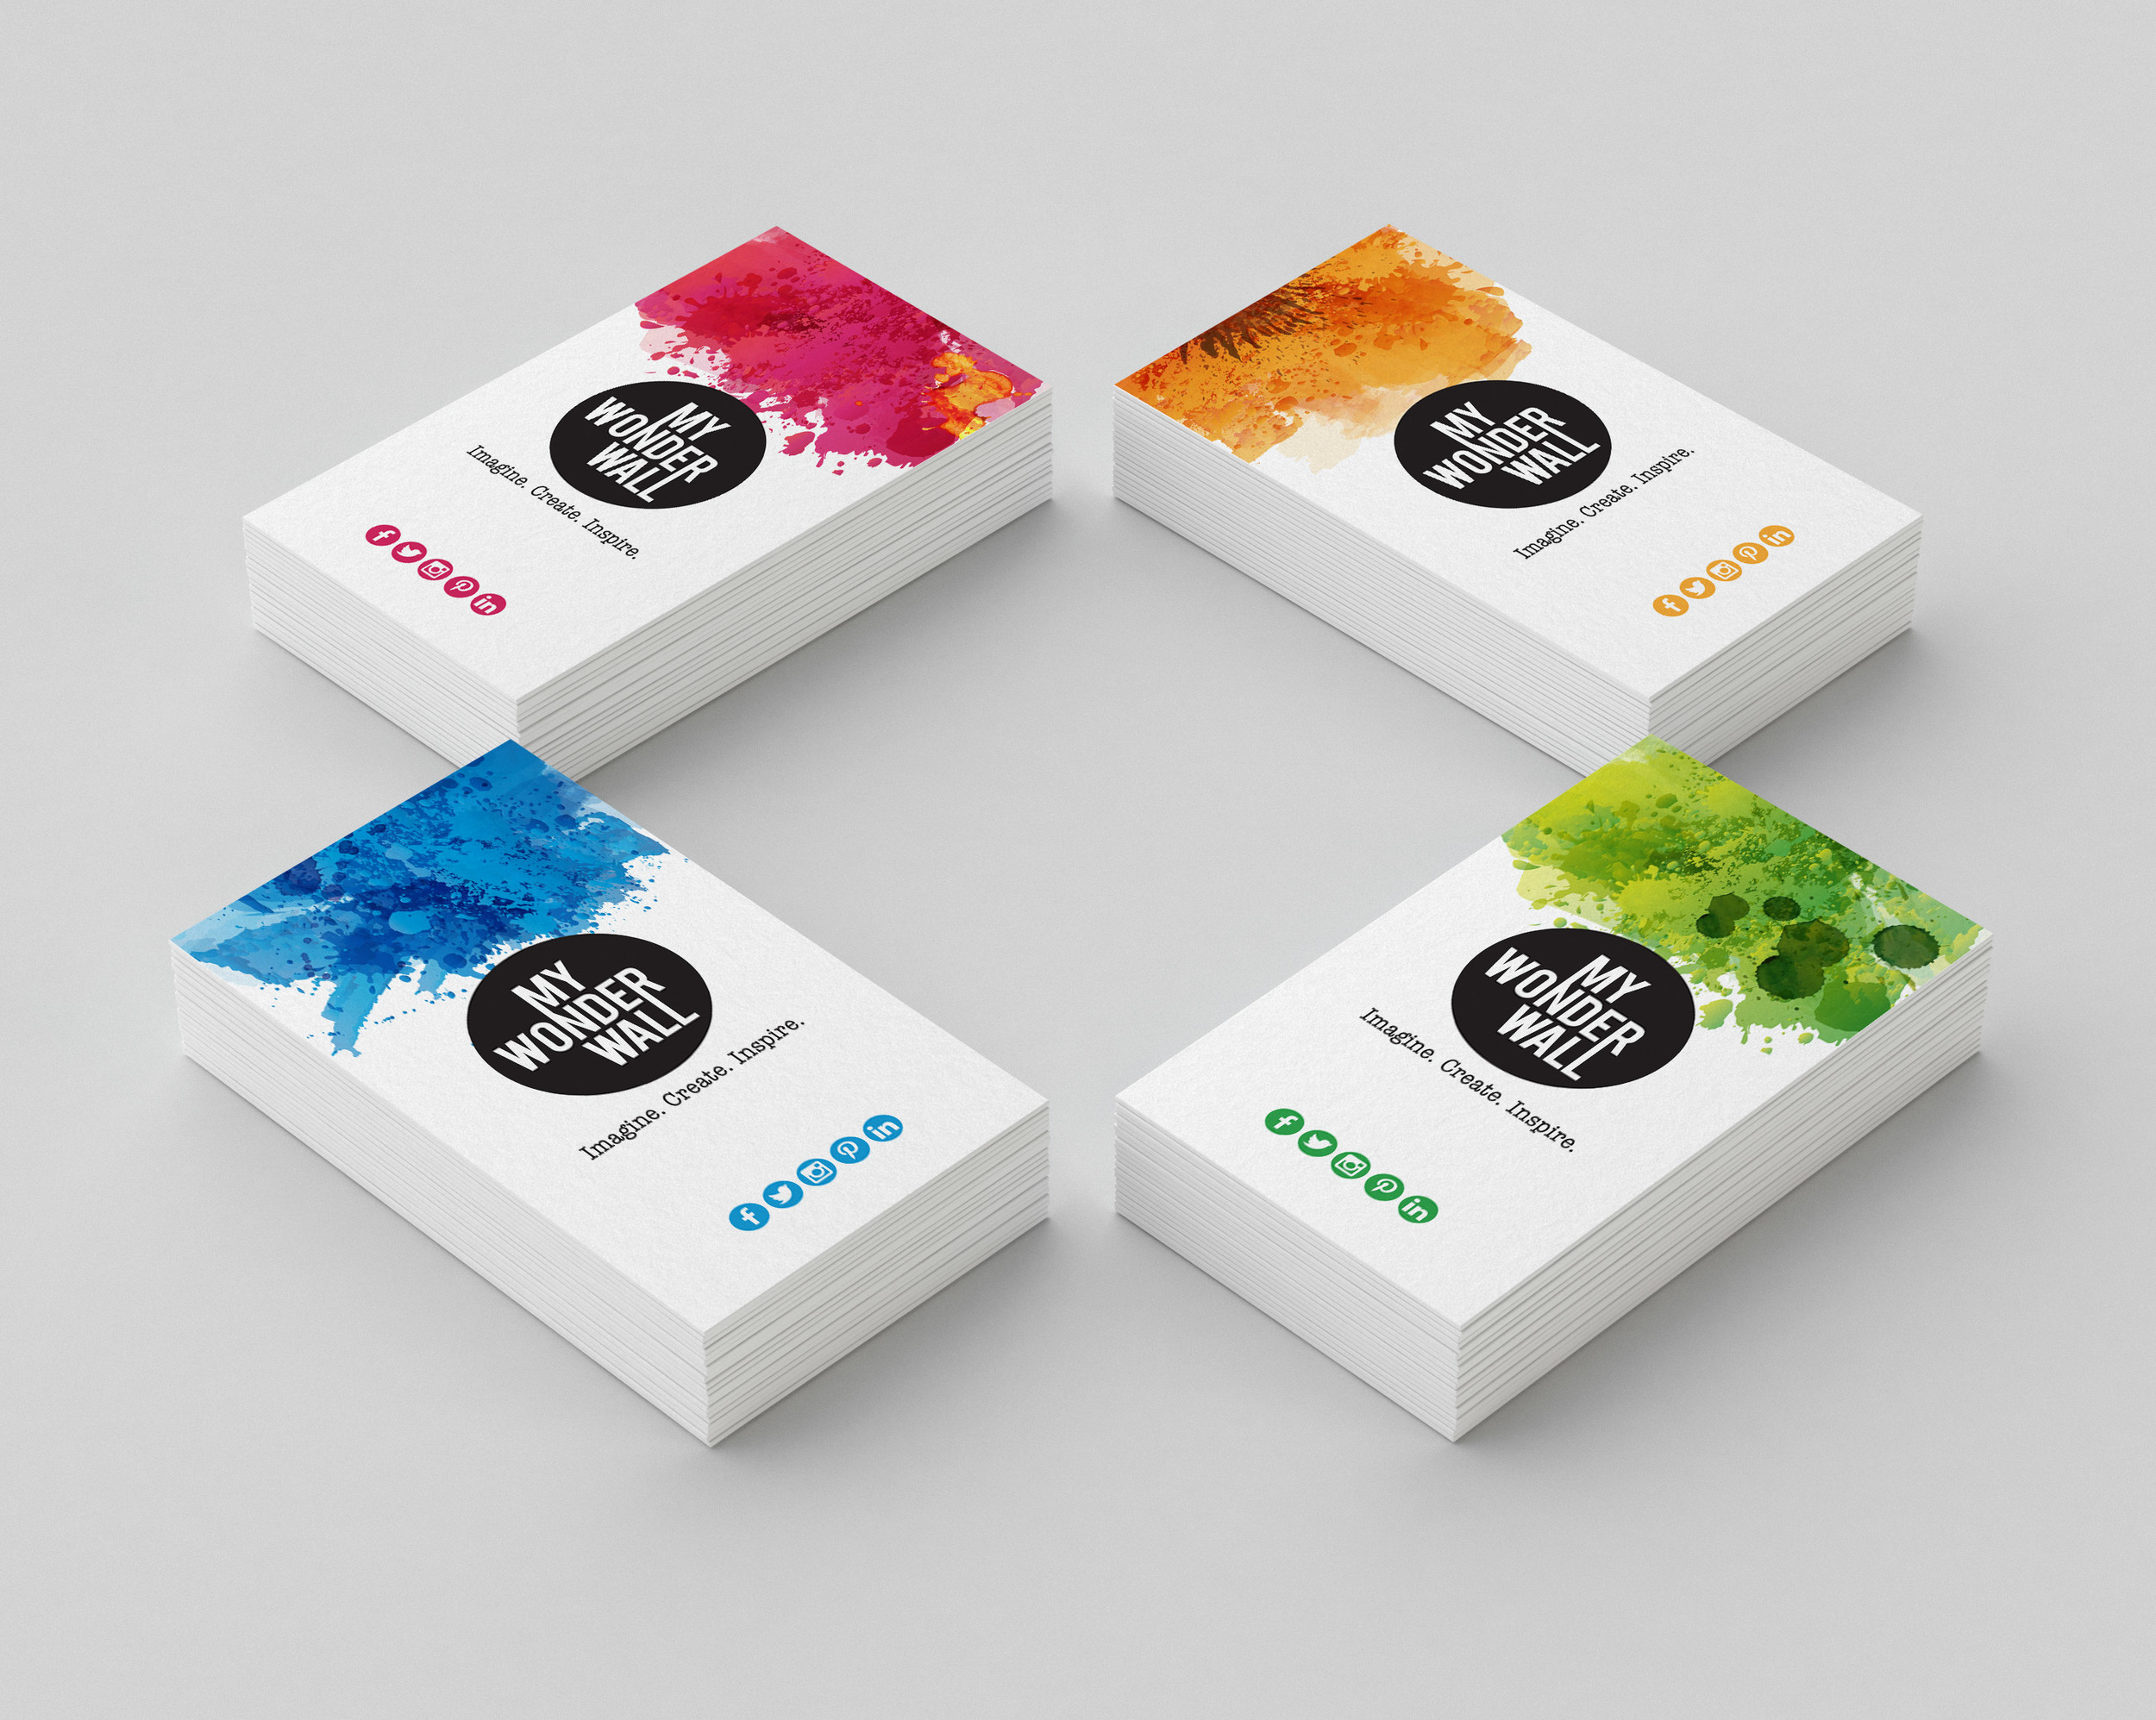 01_Free_Business_Cards_Mockup.jpg